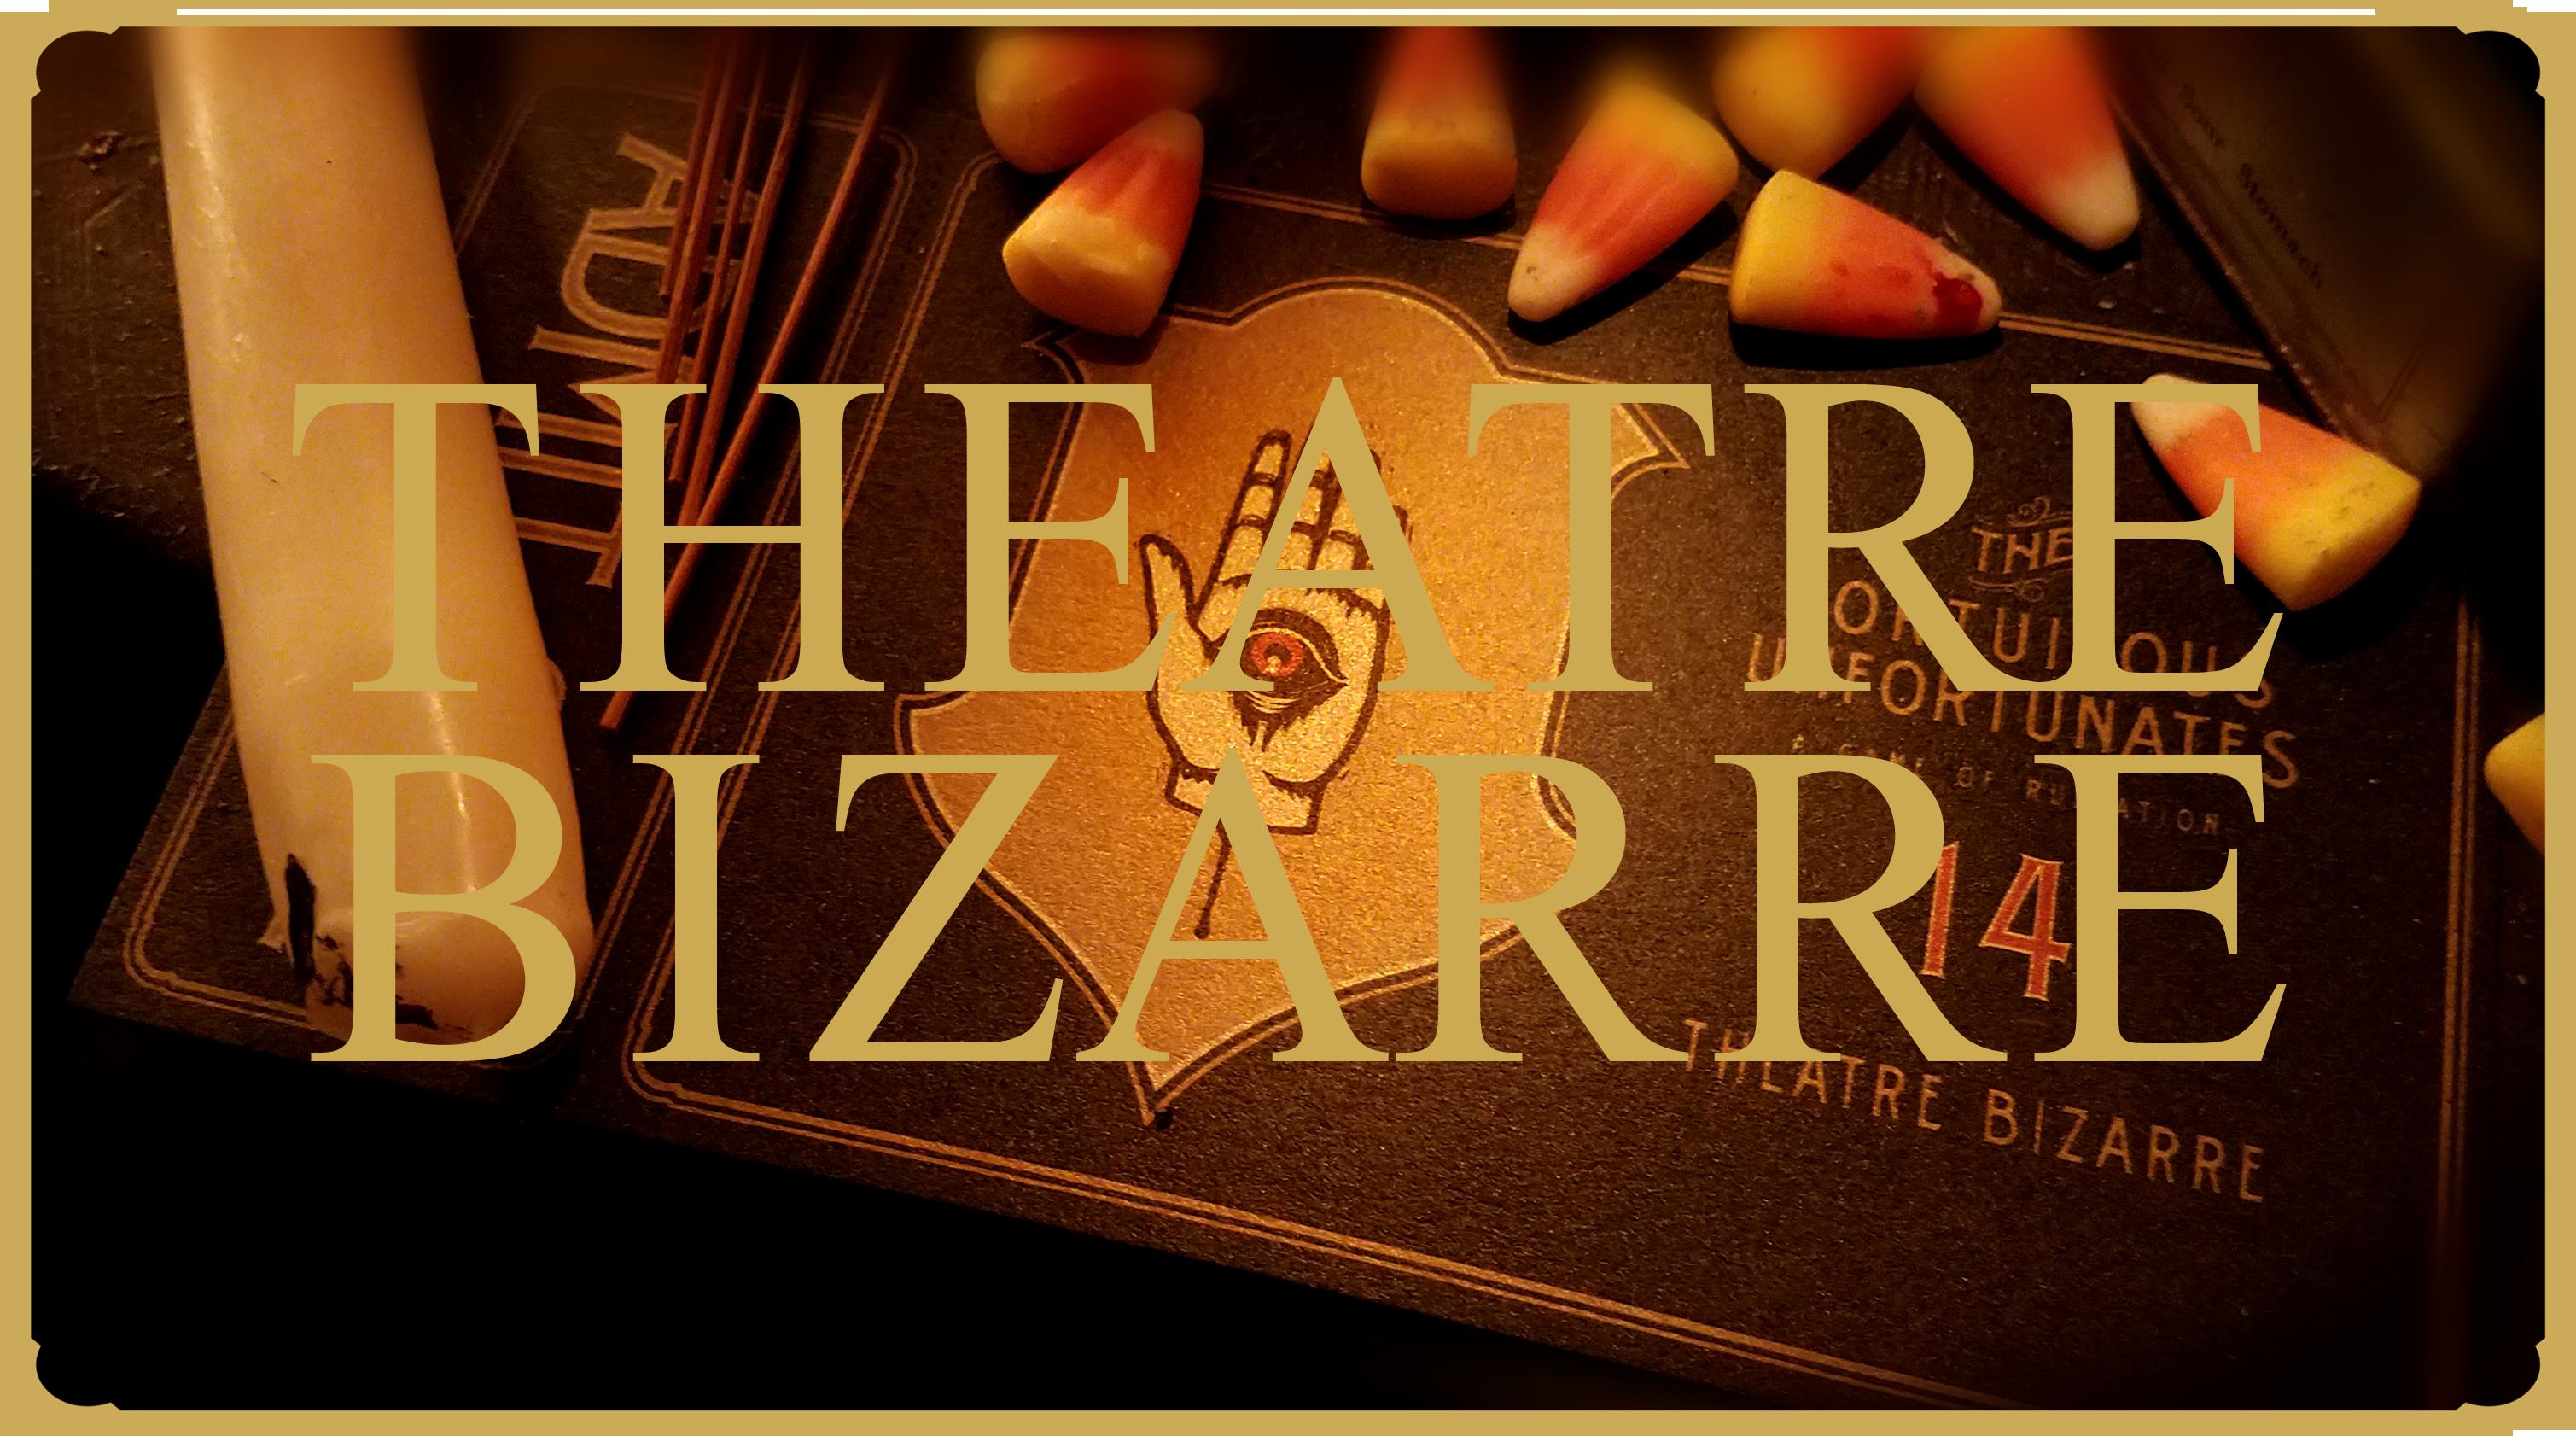 Ticket to Theatre Bizarre - October 14, 2017 66622107